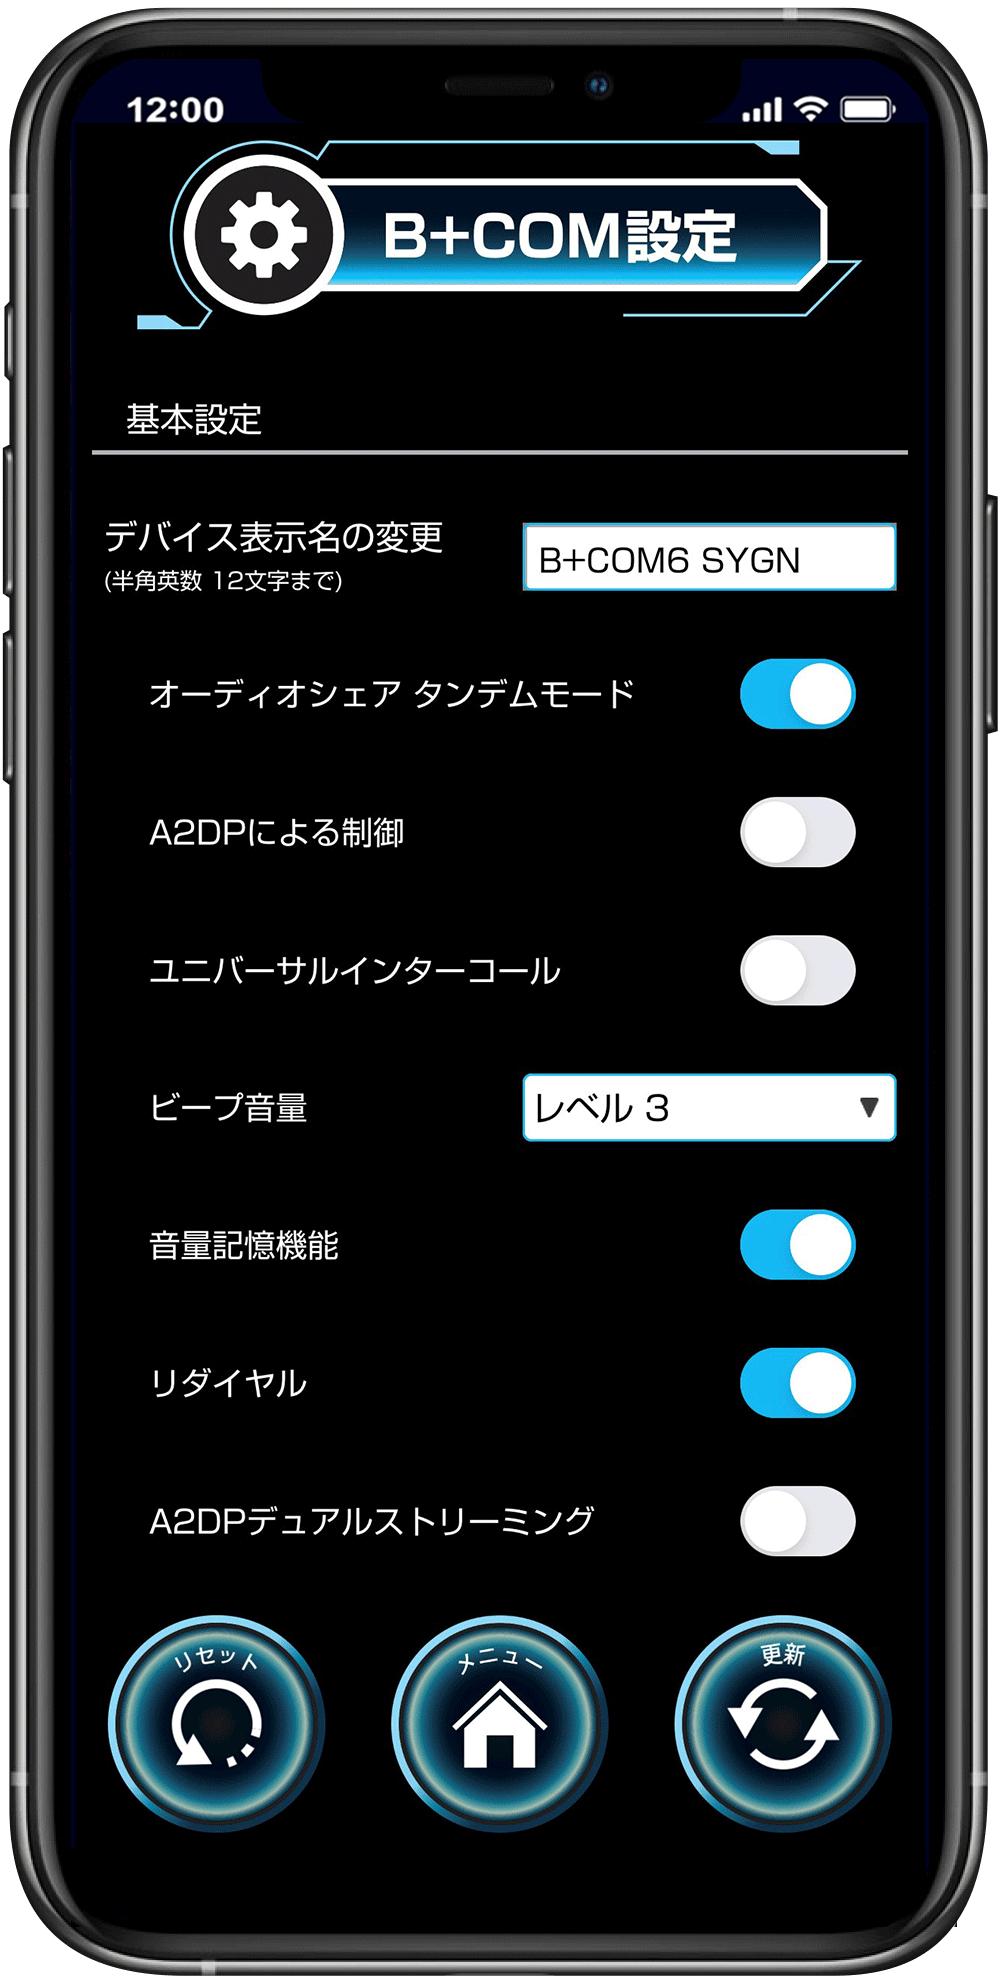 B+COM 設定